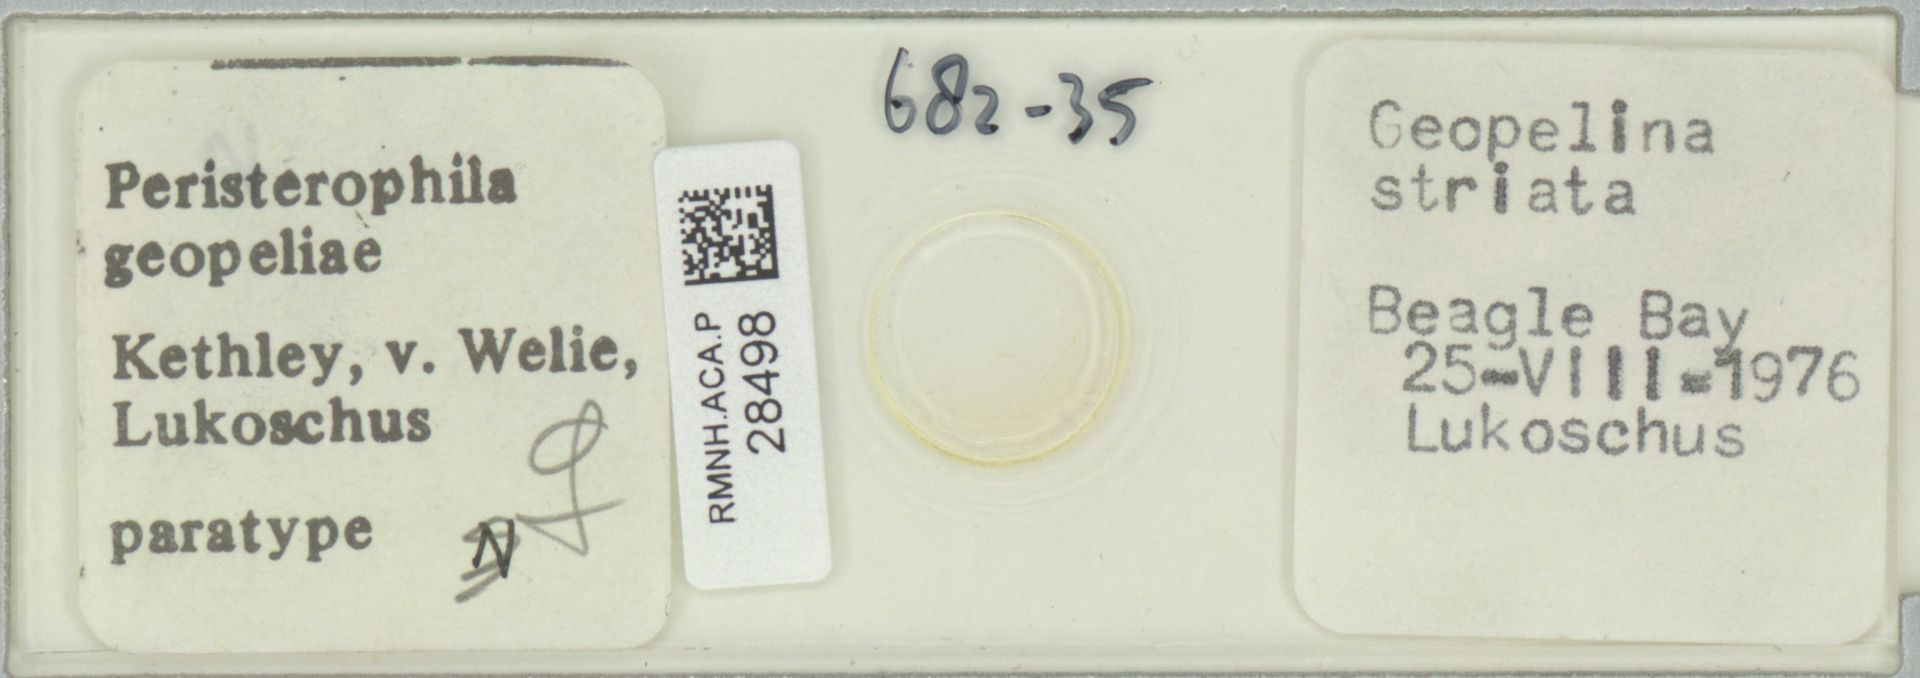 RMNH.ACA.P.28498   Peristerophila geopeliae Kethley, van Welie, Lukoschus